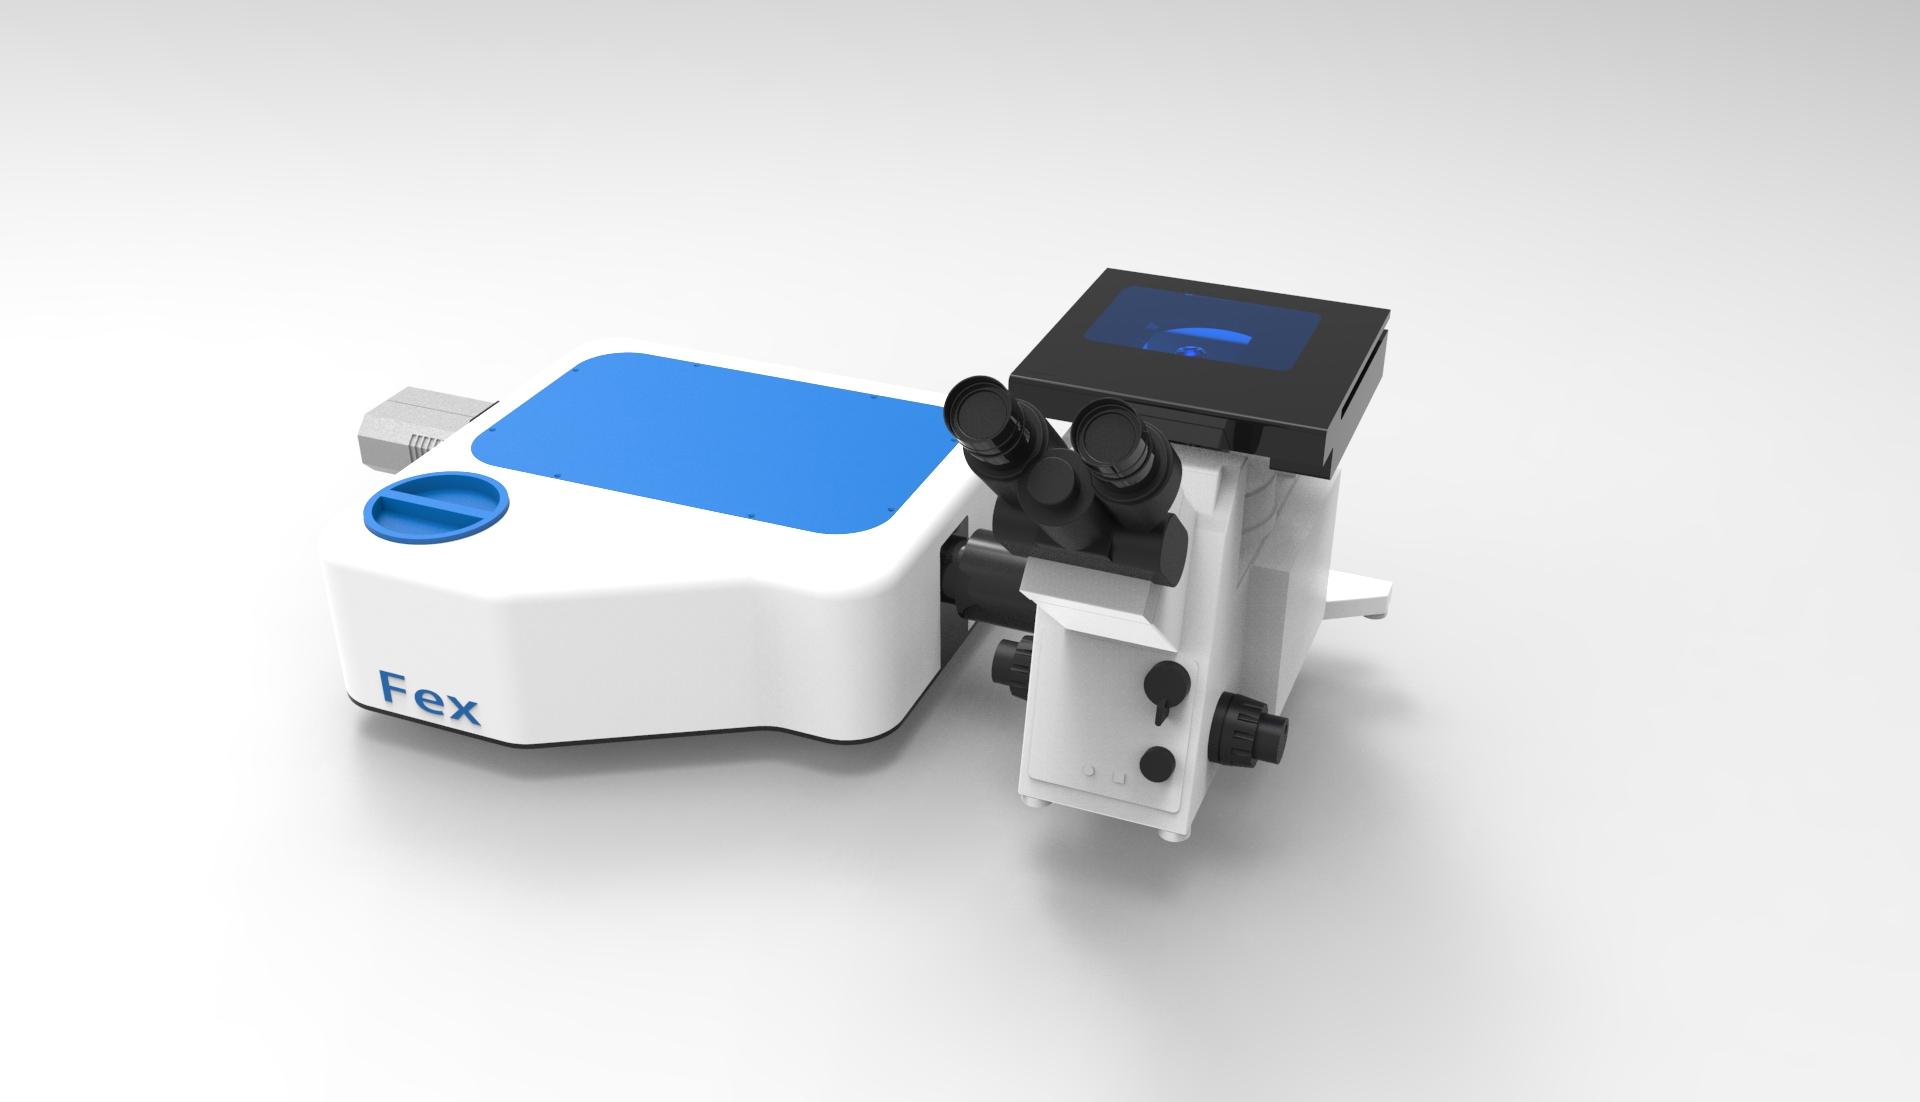 FEX(Inverted) - Raman Spectroscopy